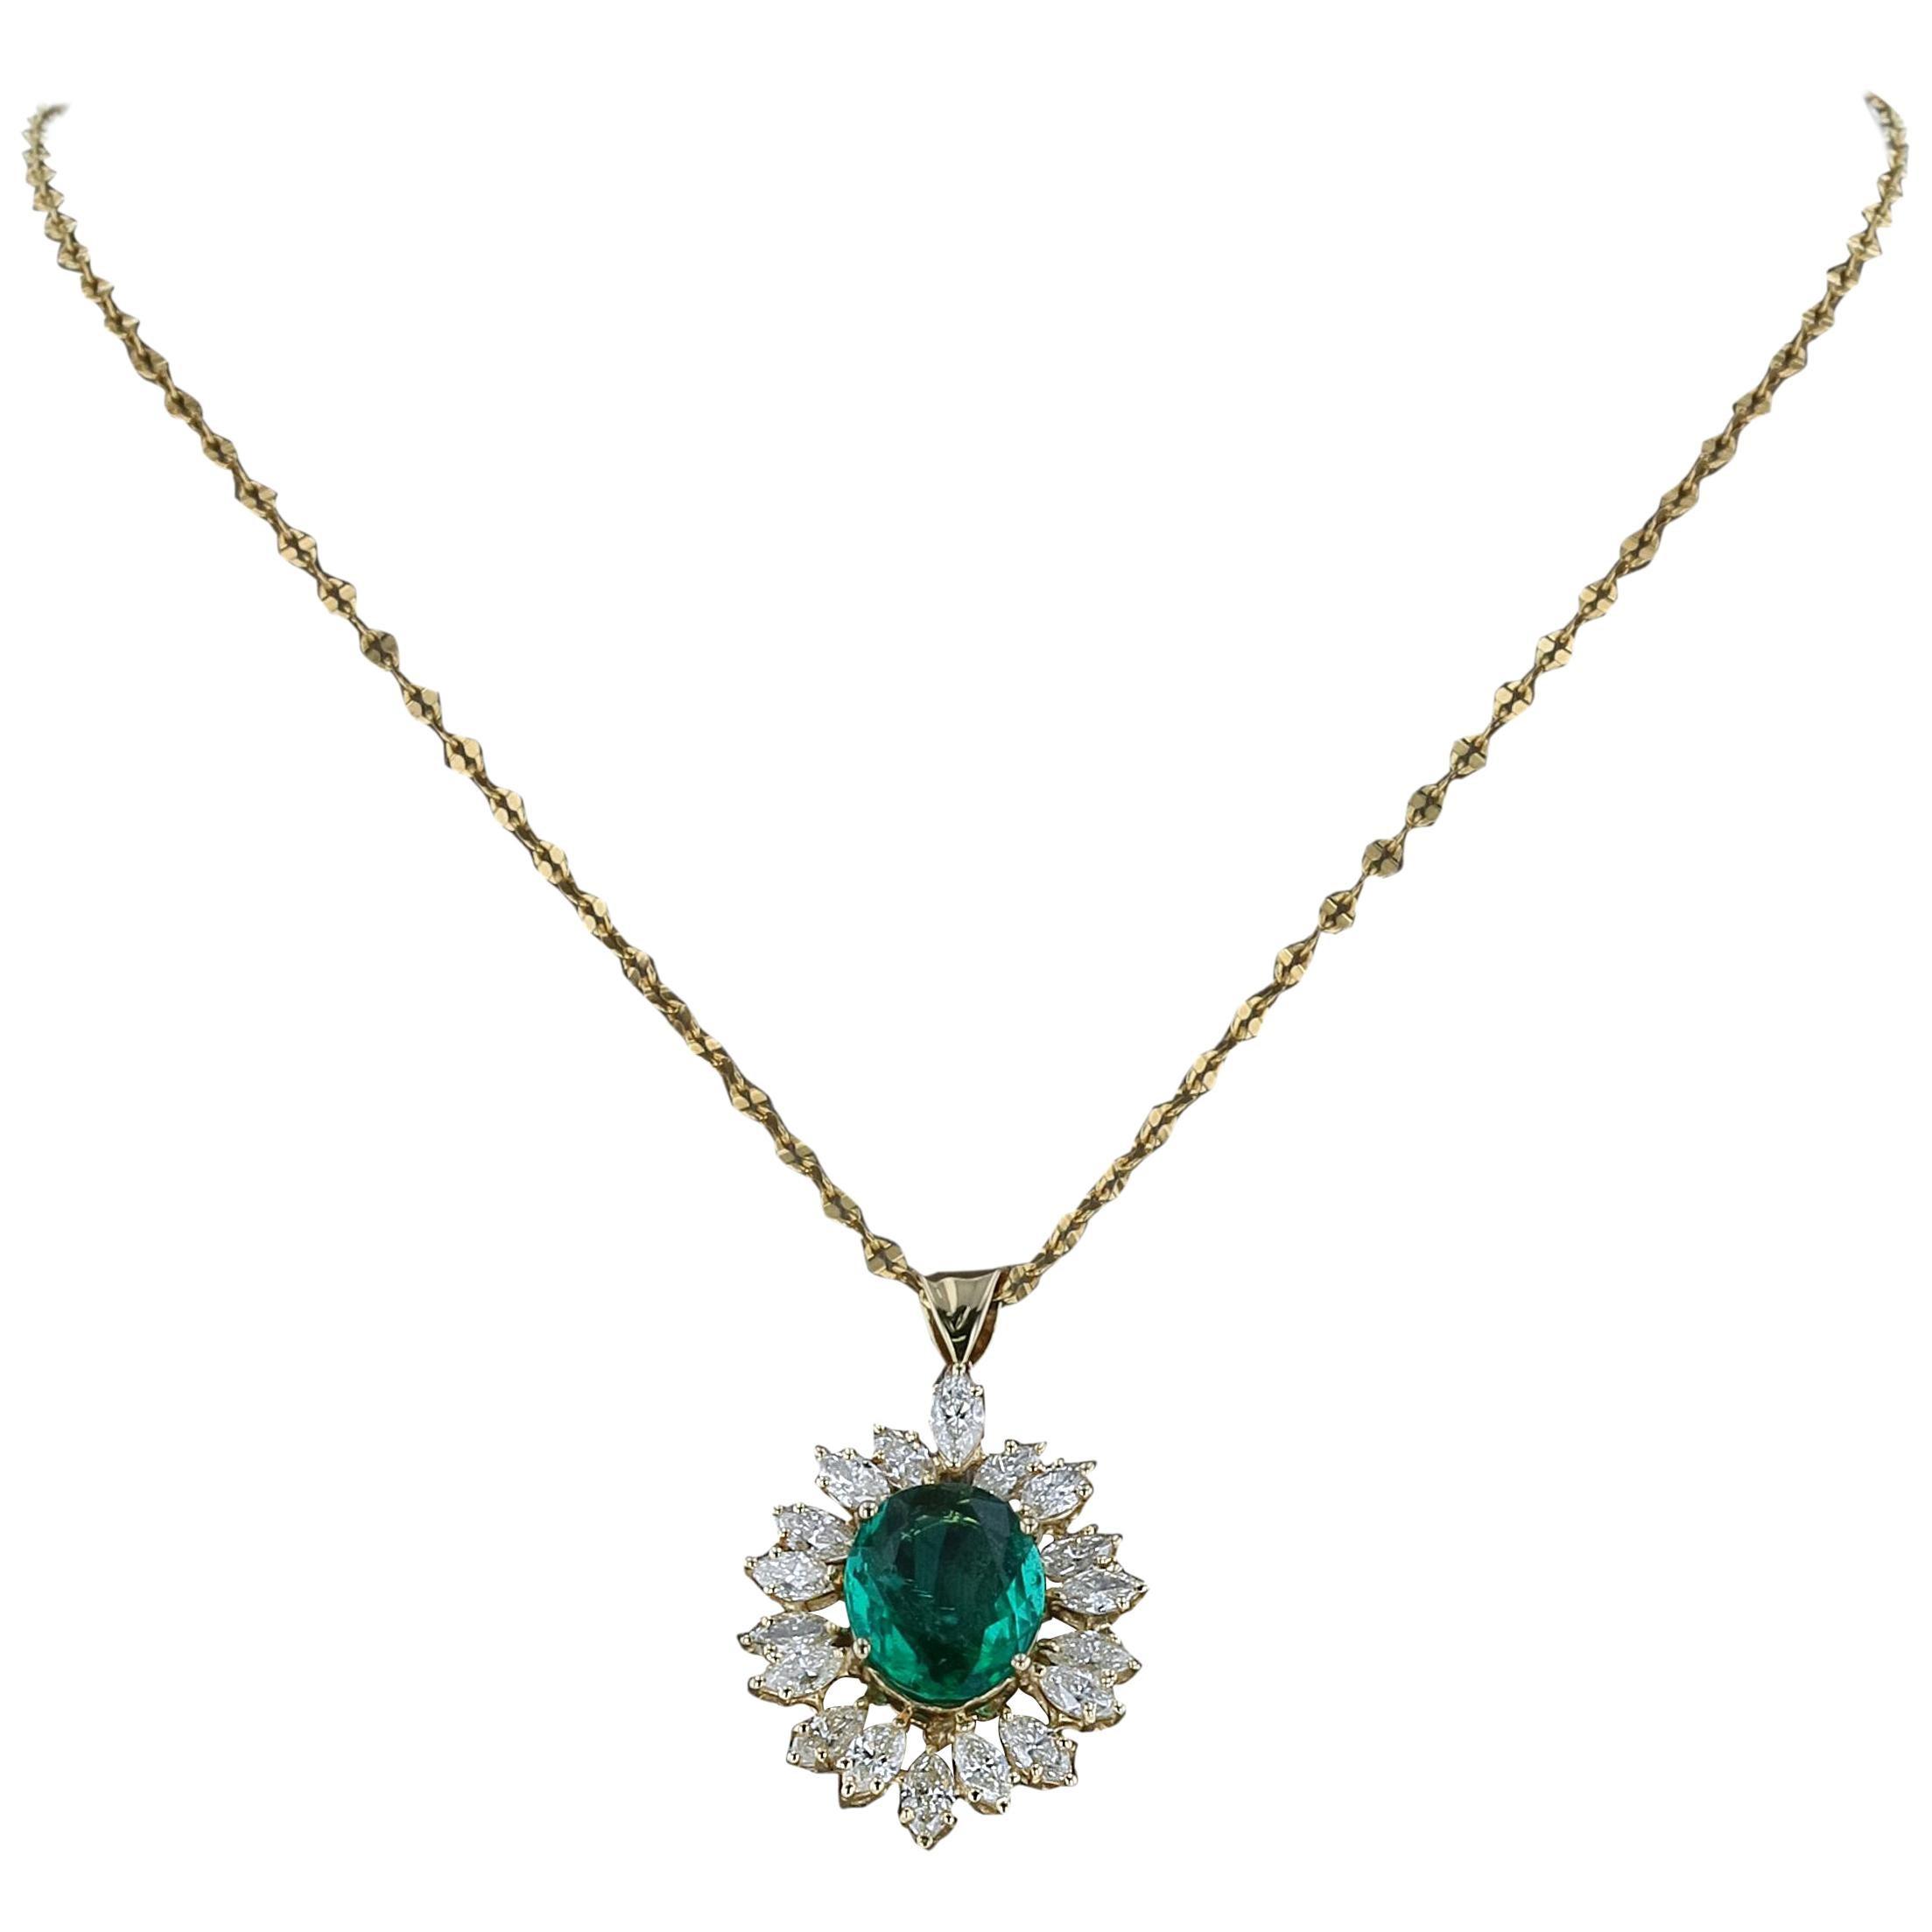 Amwaj Jewelry Emerald Necklace in 18 Karat Yellow Gold